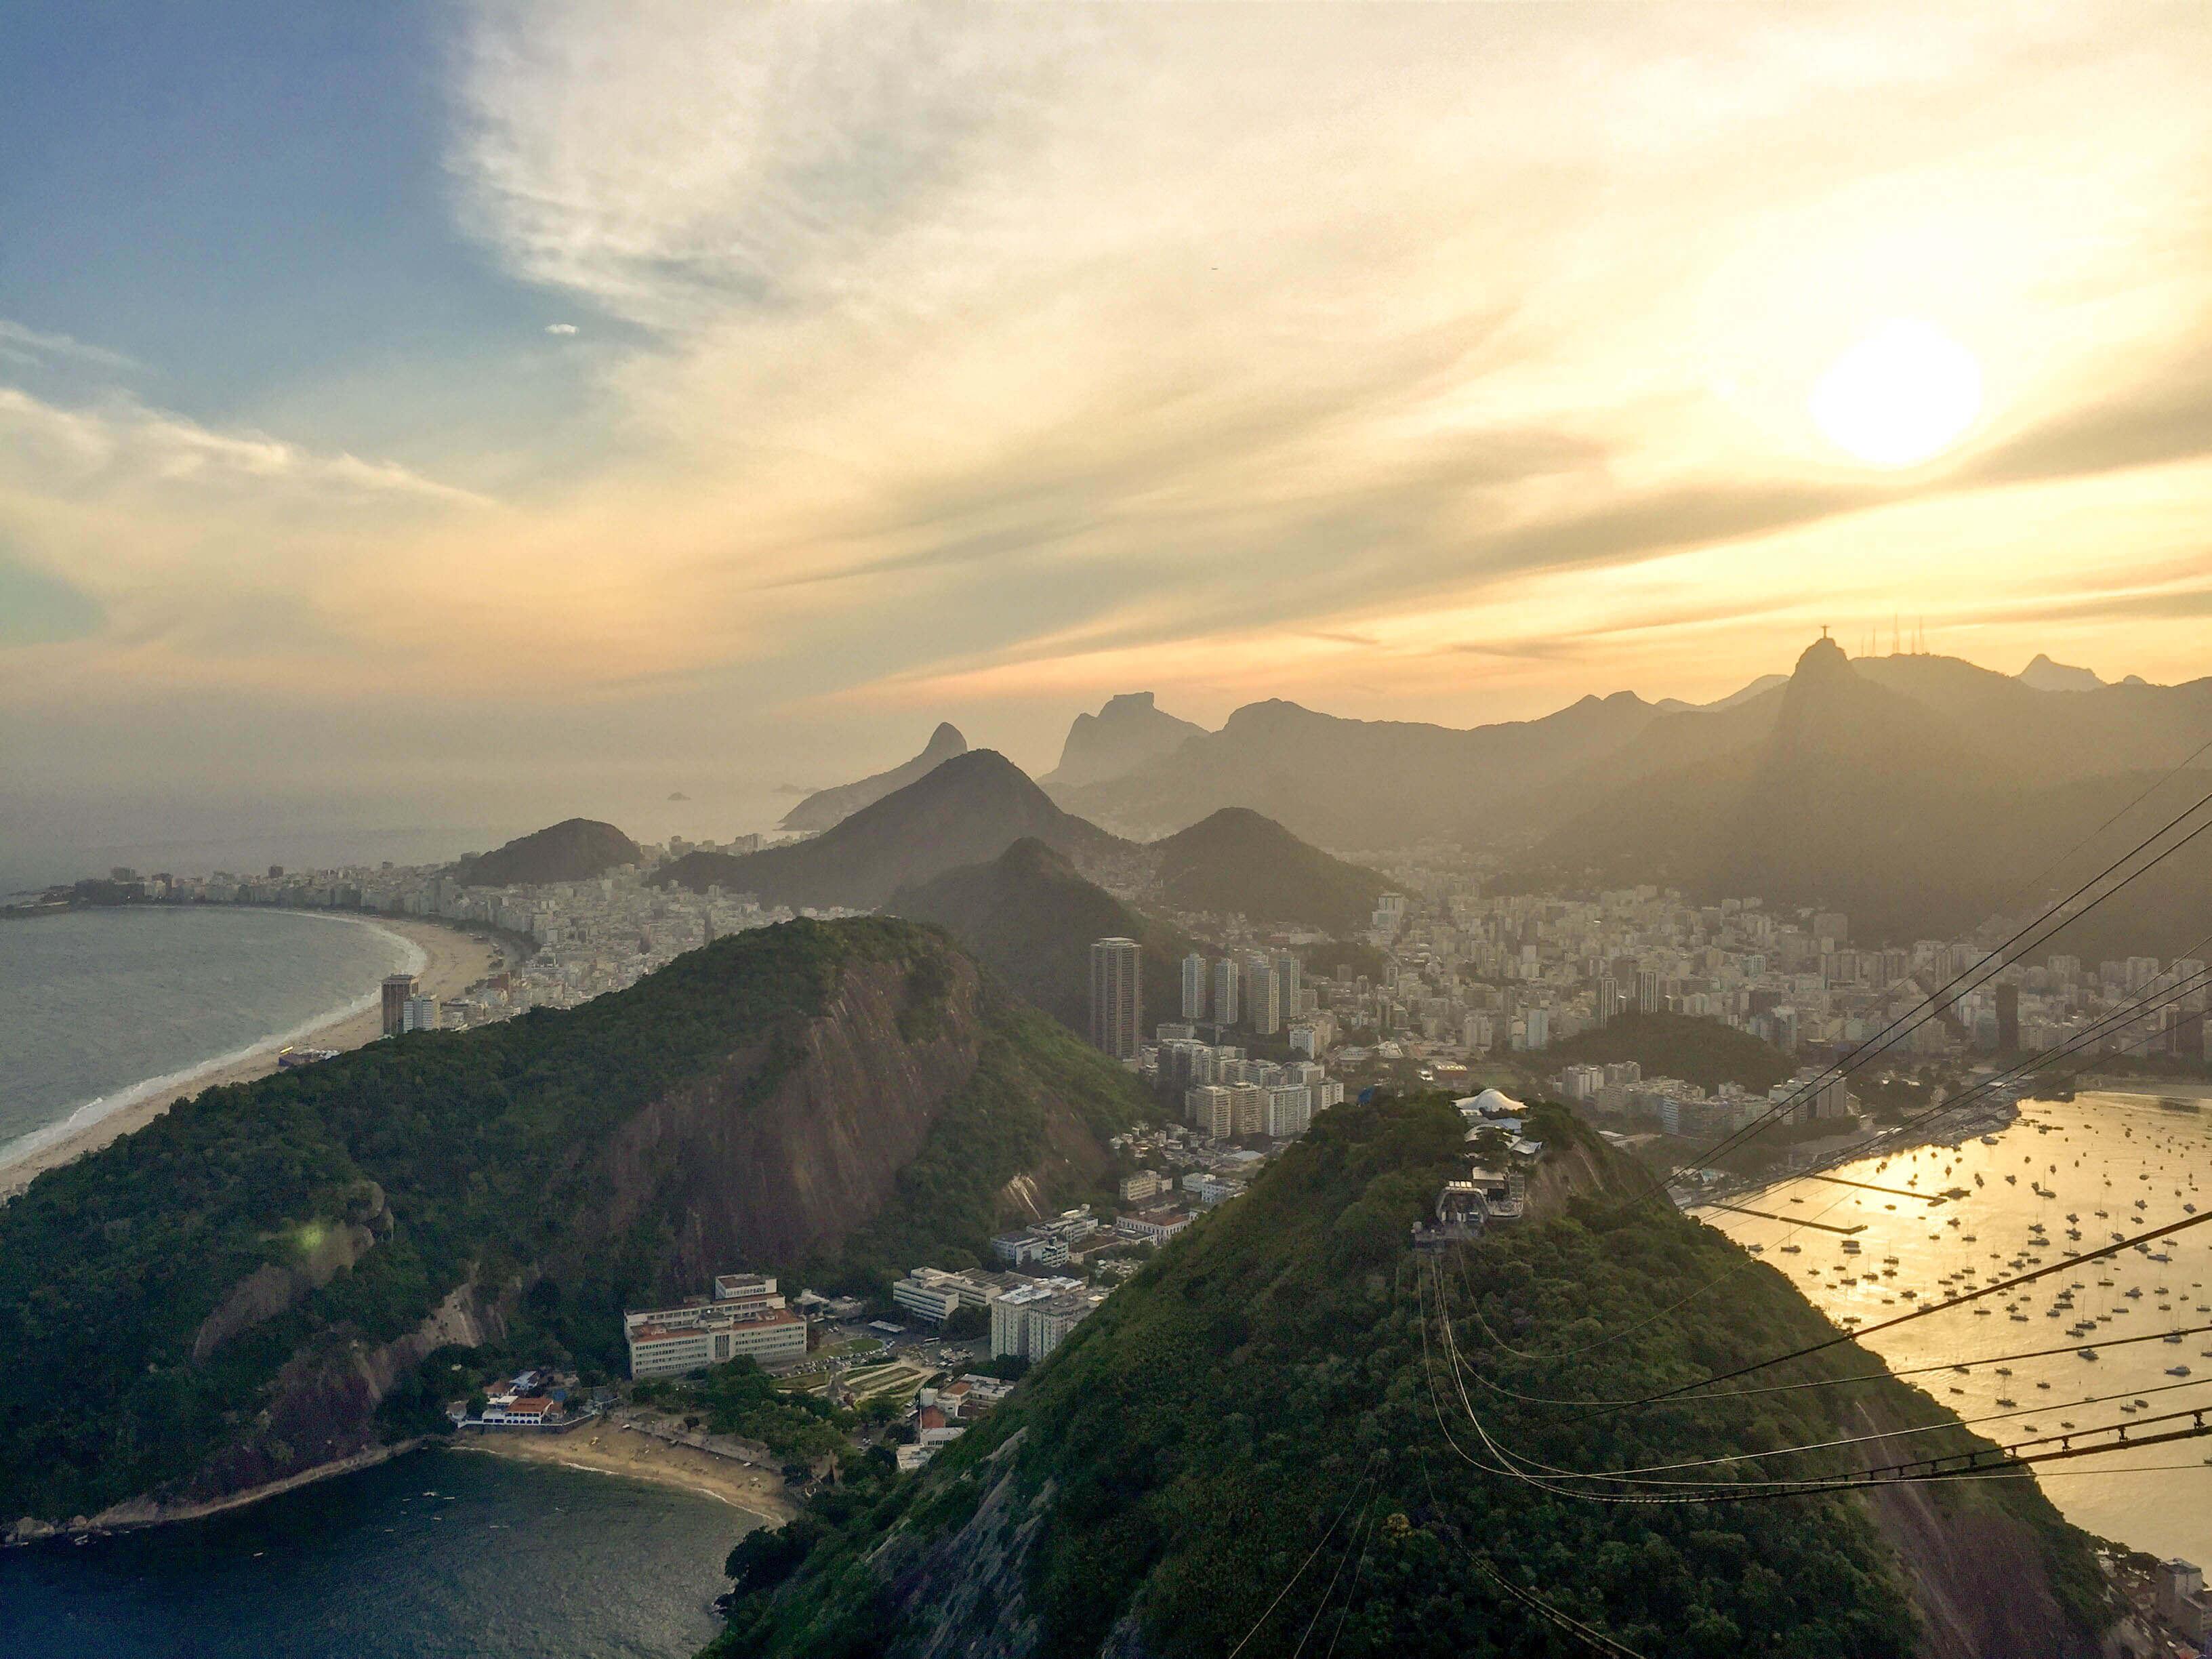 sunset from atop Pão de Açúcar